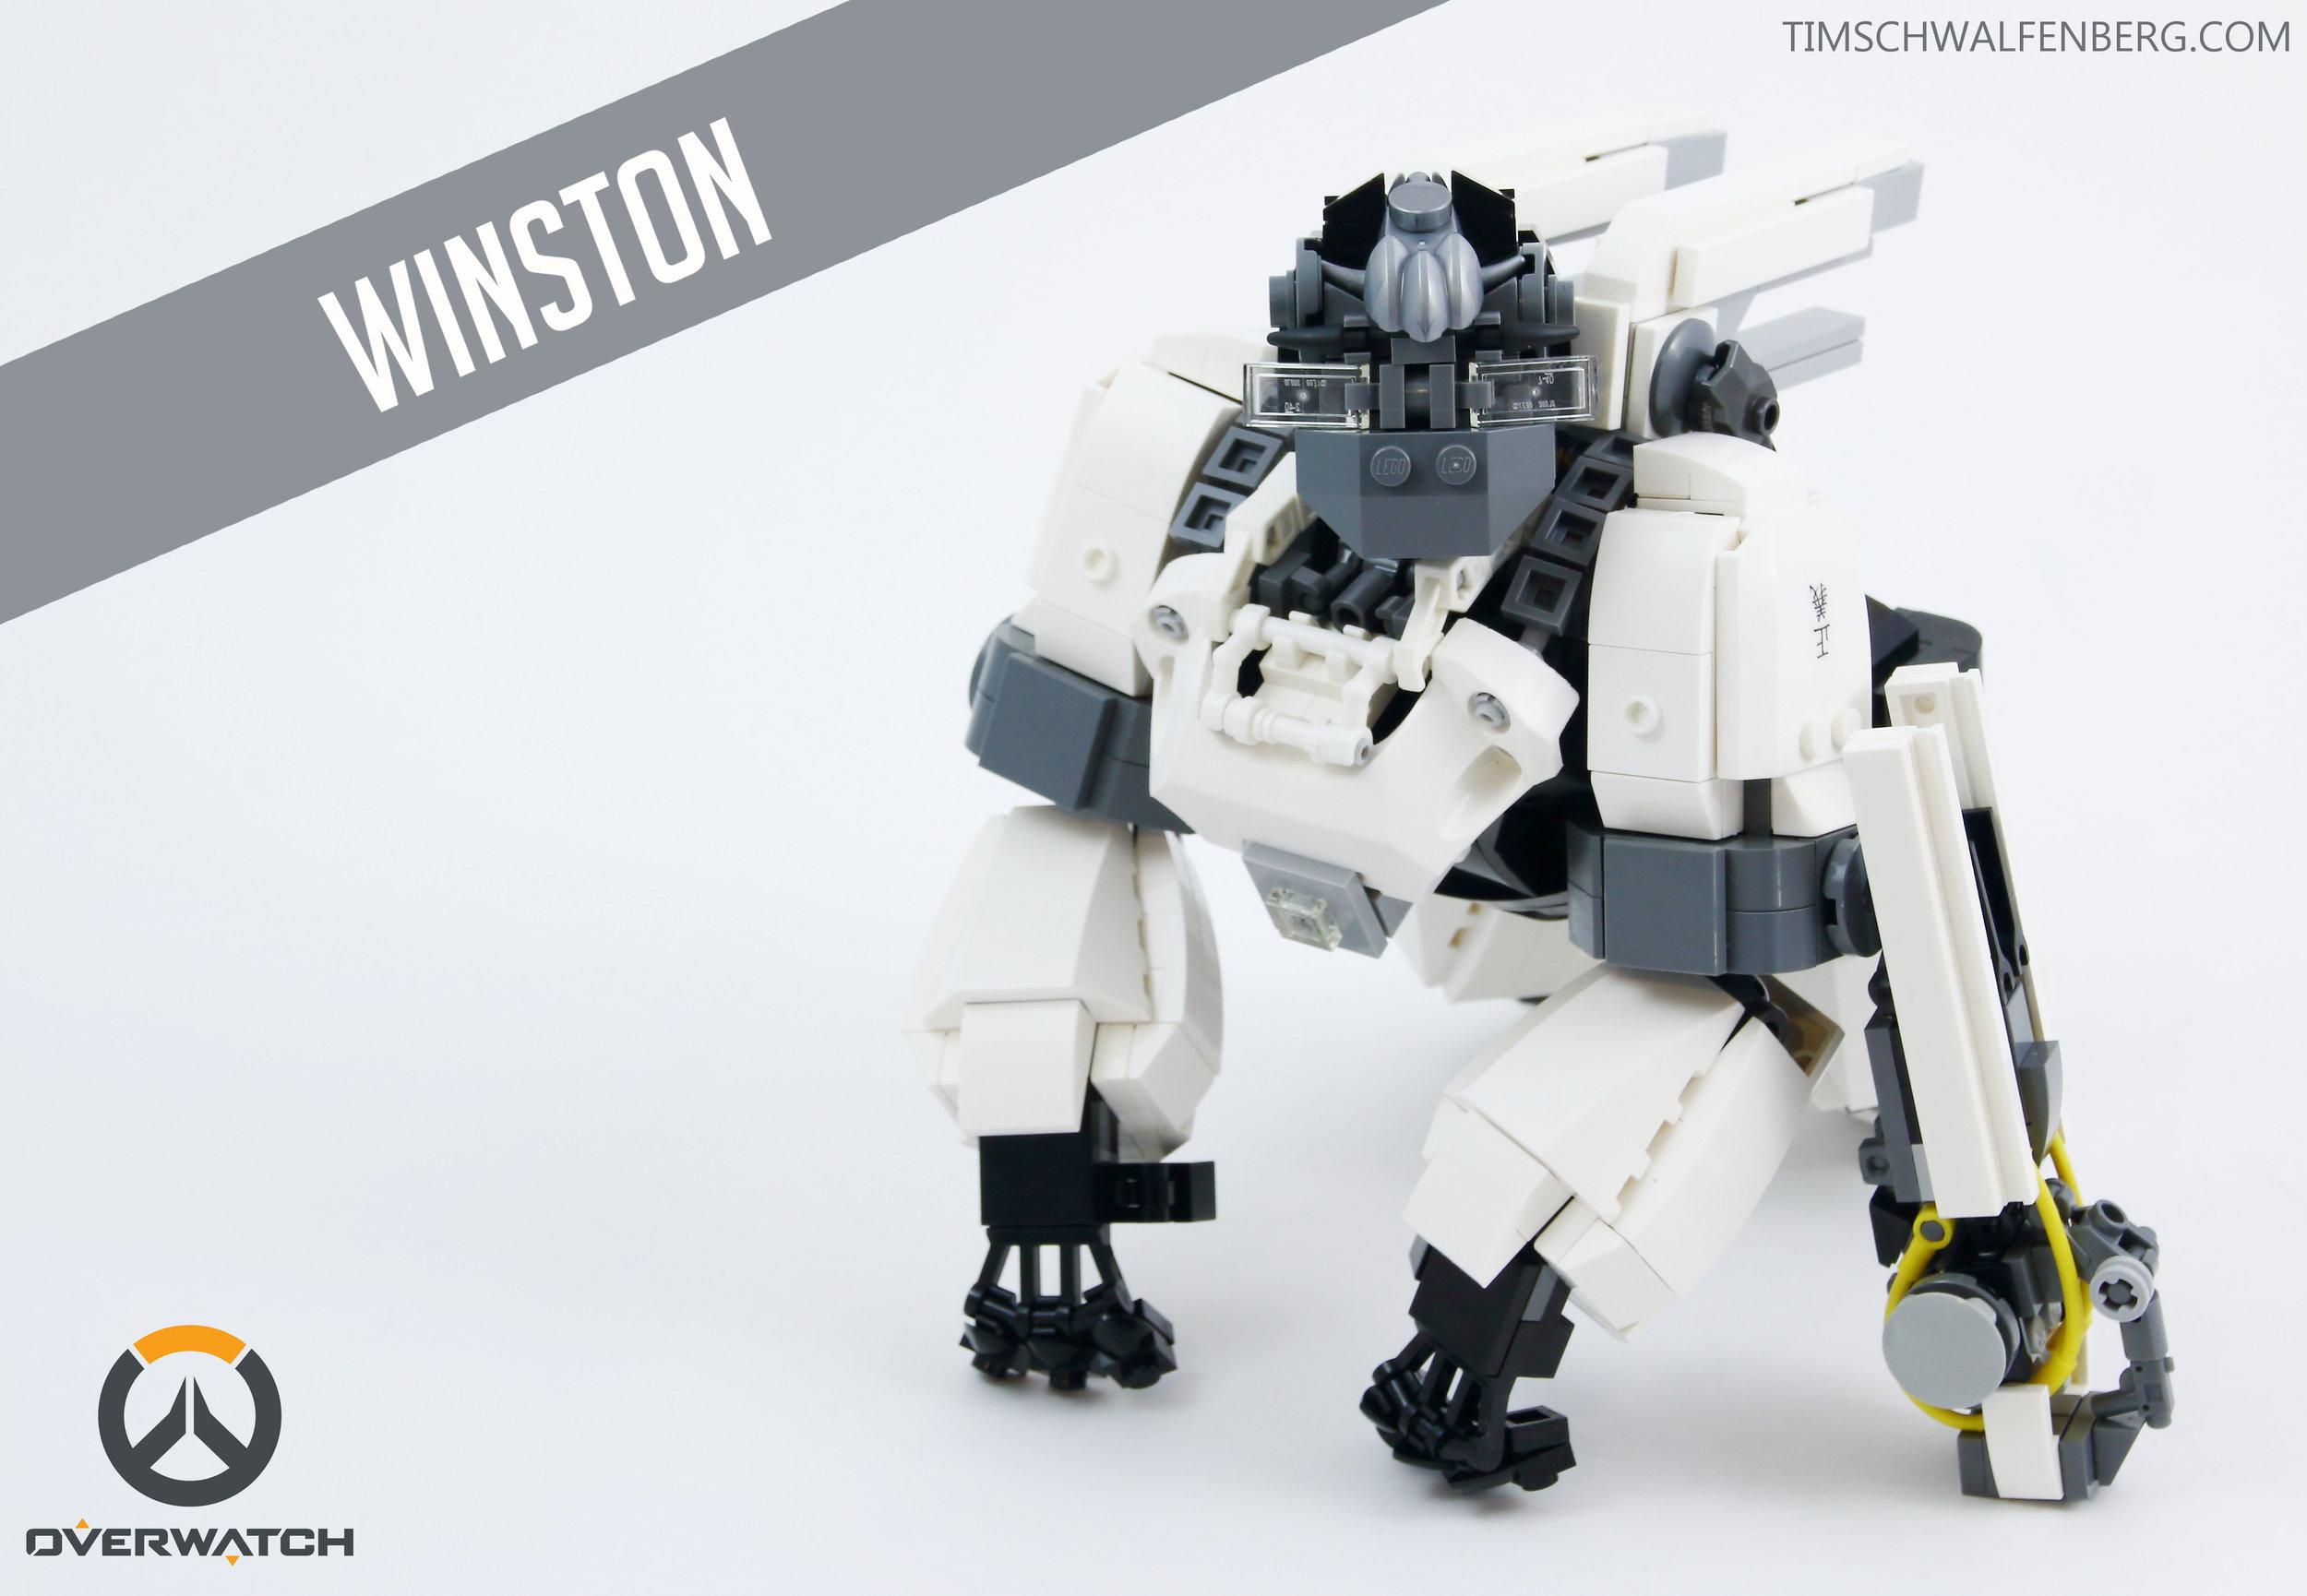 winston_27521312256_o.jpg